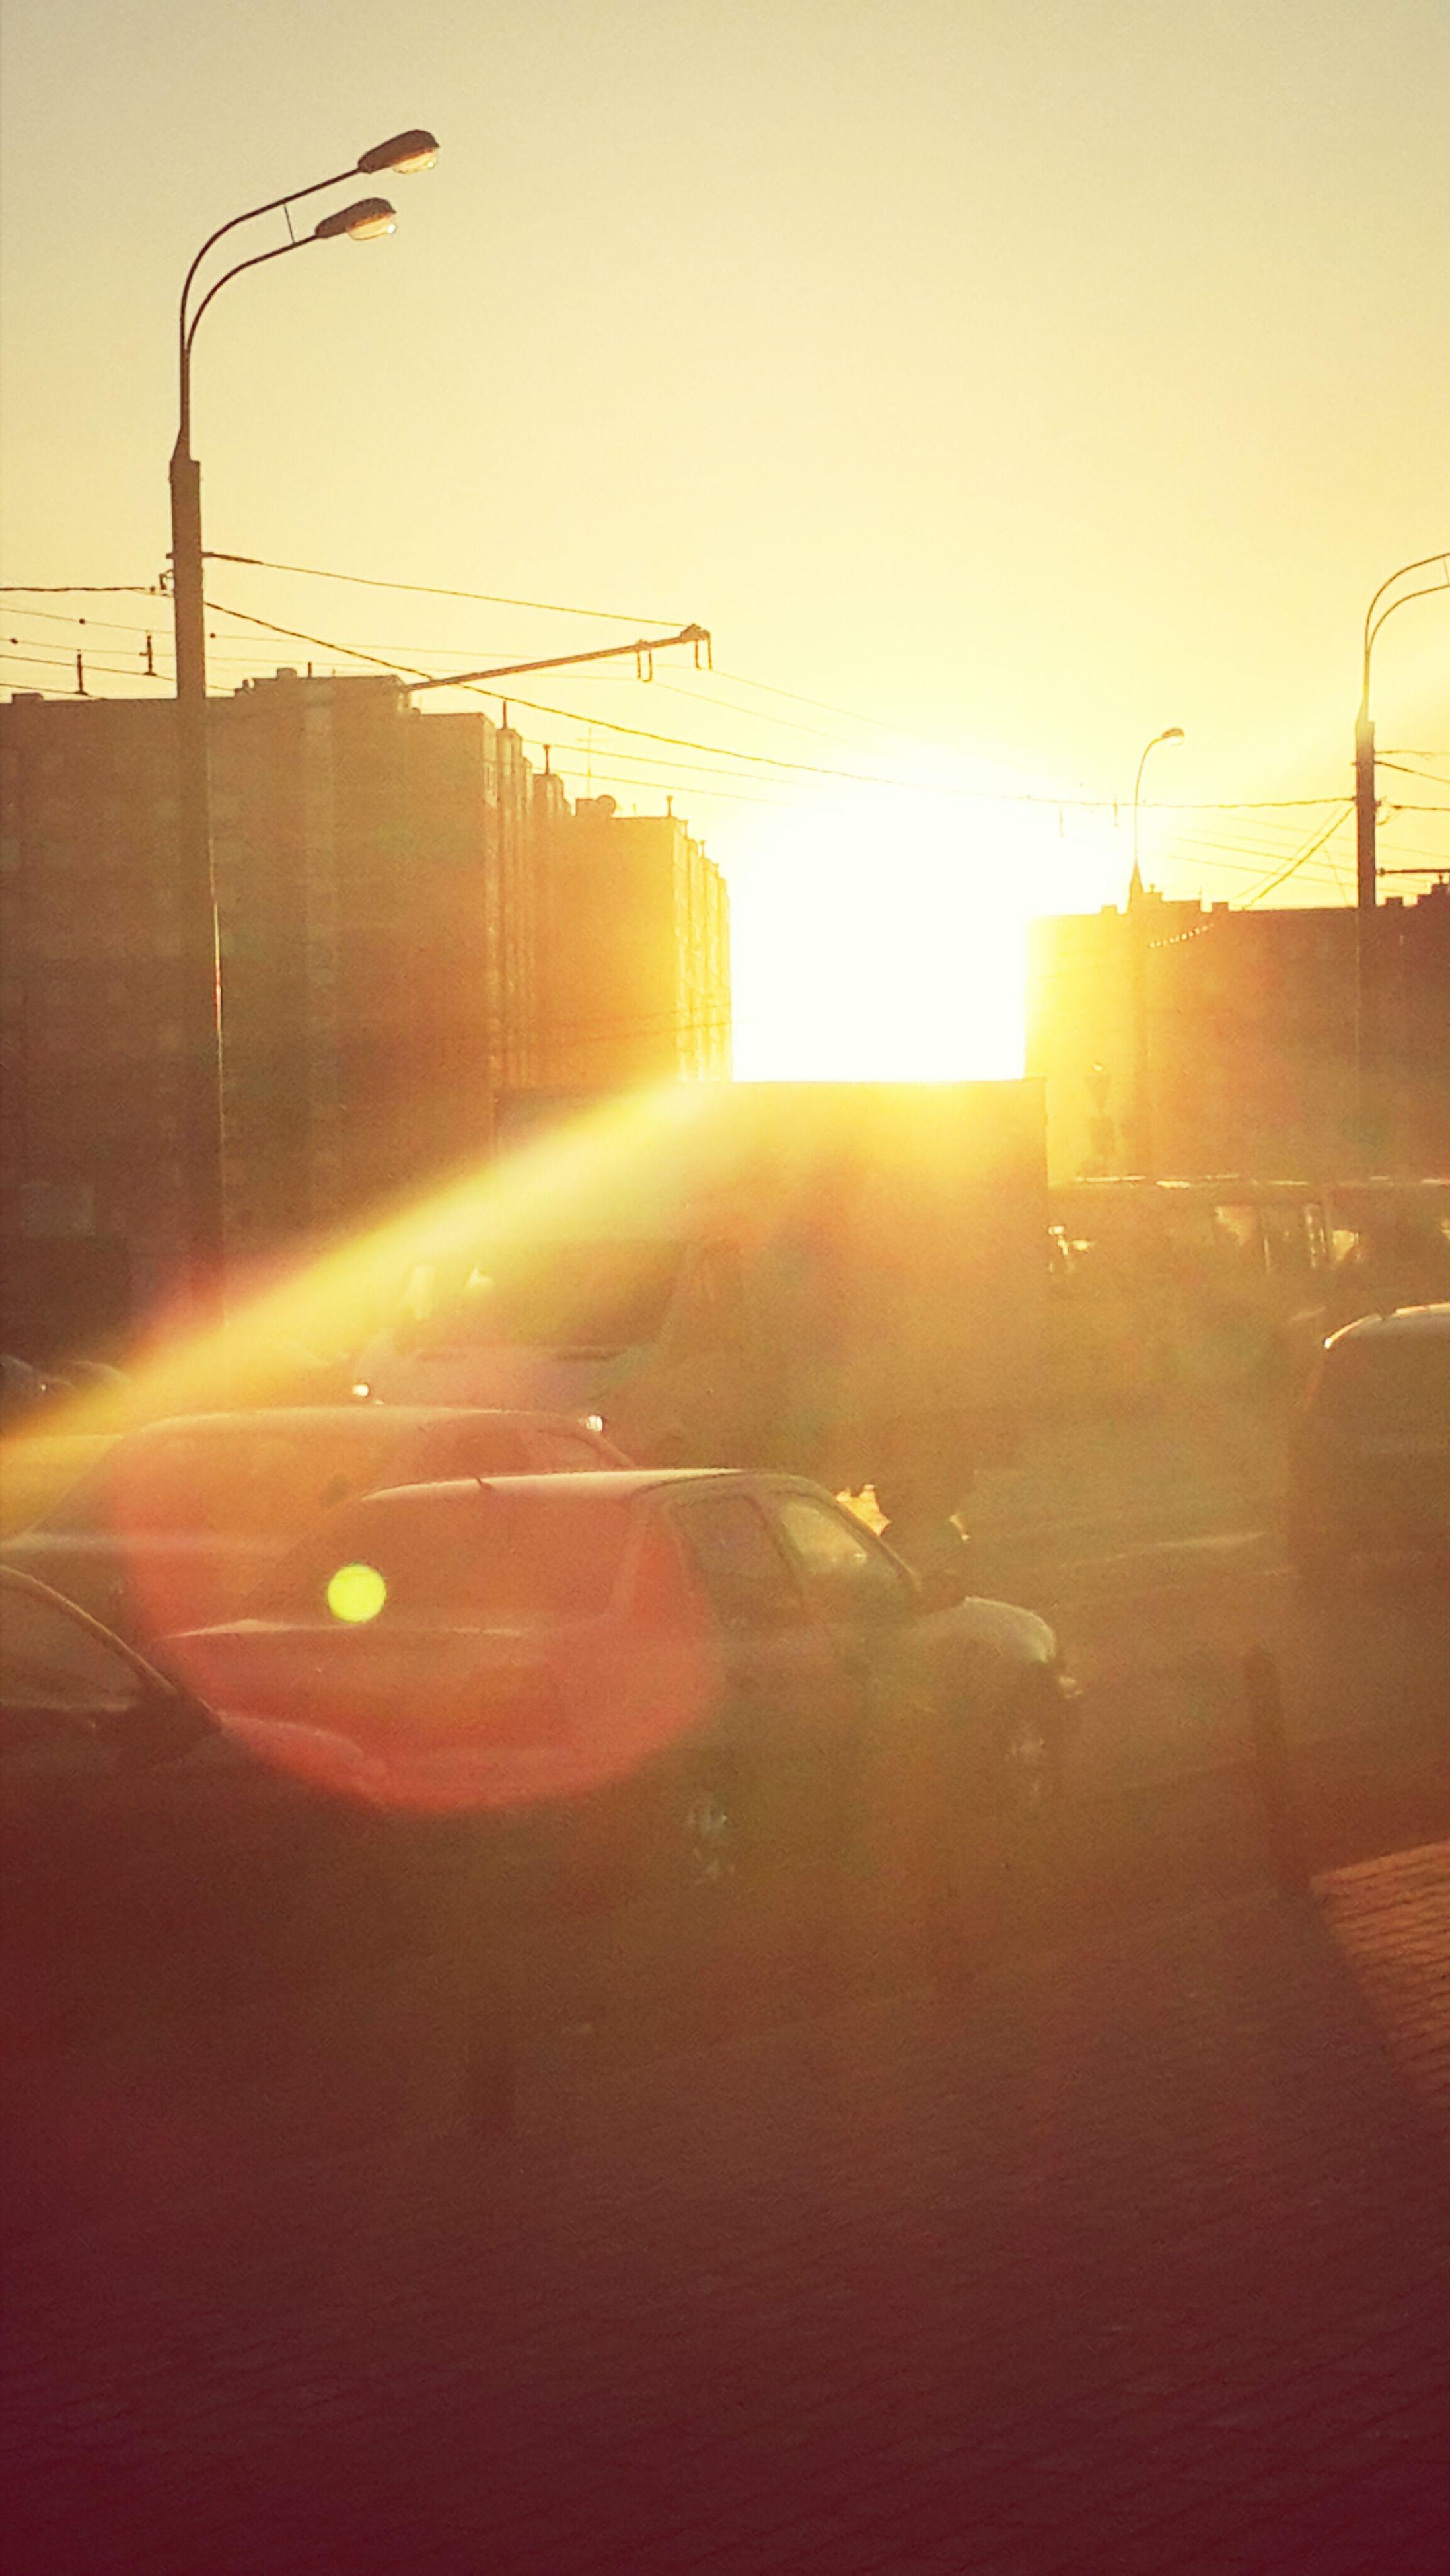 sunset, transportation, sun, street light, road, mode of transport, sunlight, car, lens flare, land vehicle, sunbeam, clear sky, street, silhouette, sky, electricity pylon, outdoors, no people, orange color, built structure